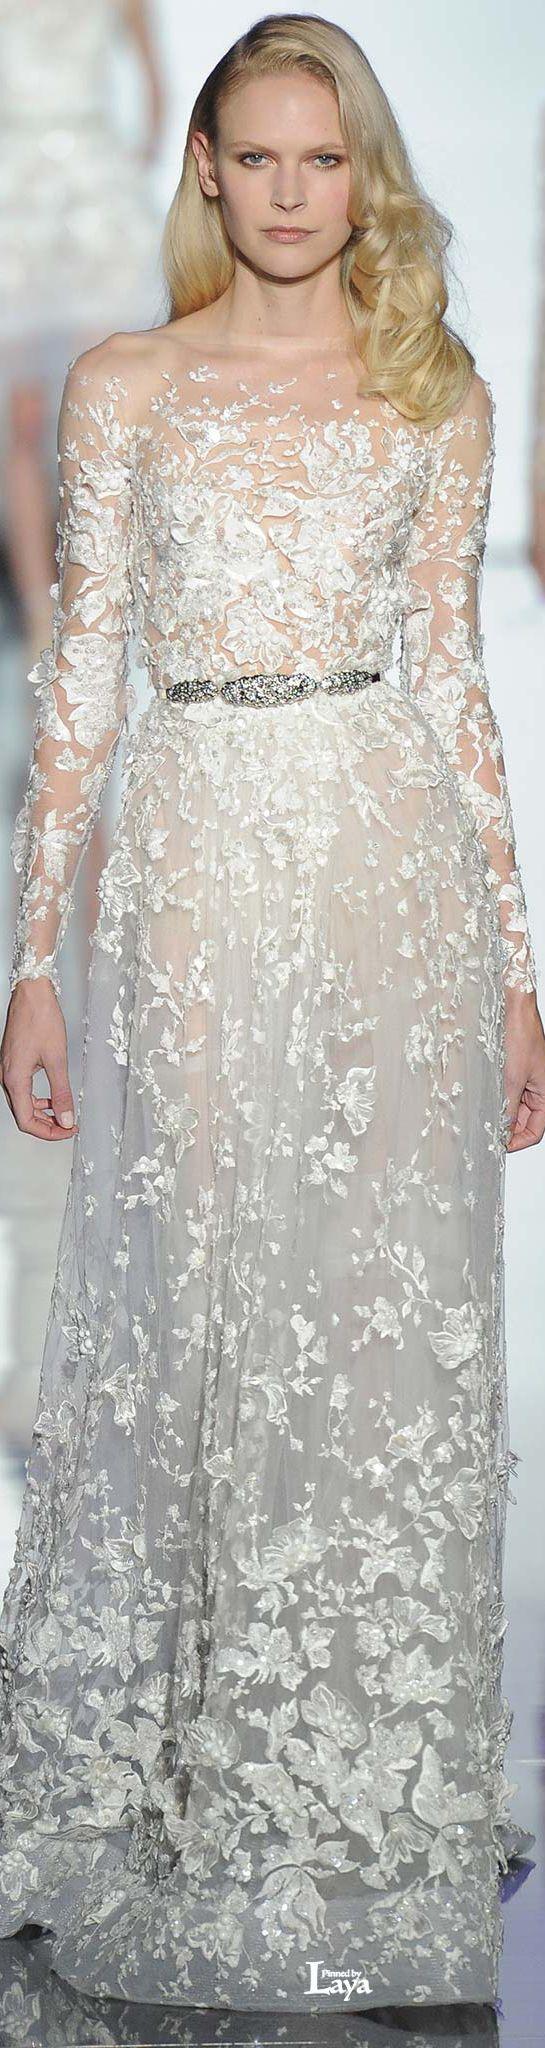 Zuhair Murad Spring/Summer 2015 Couture